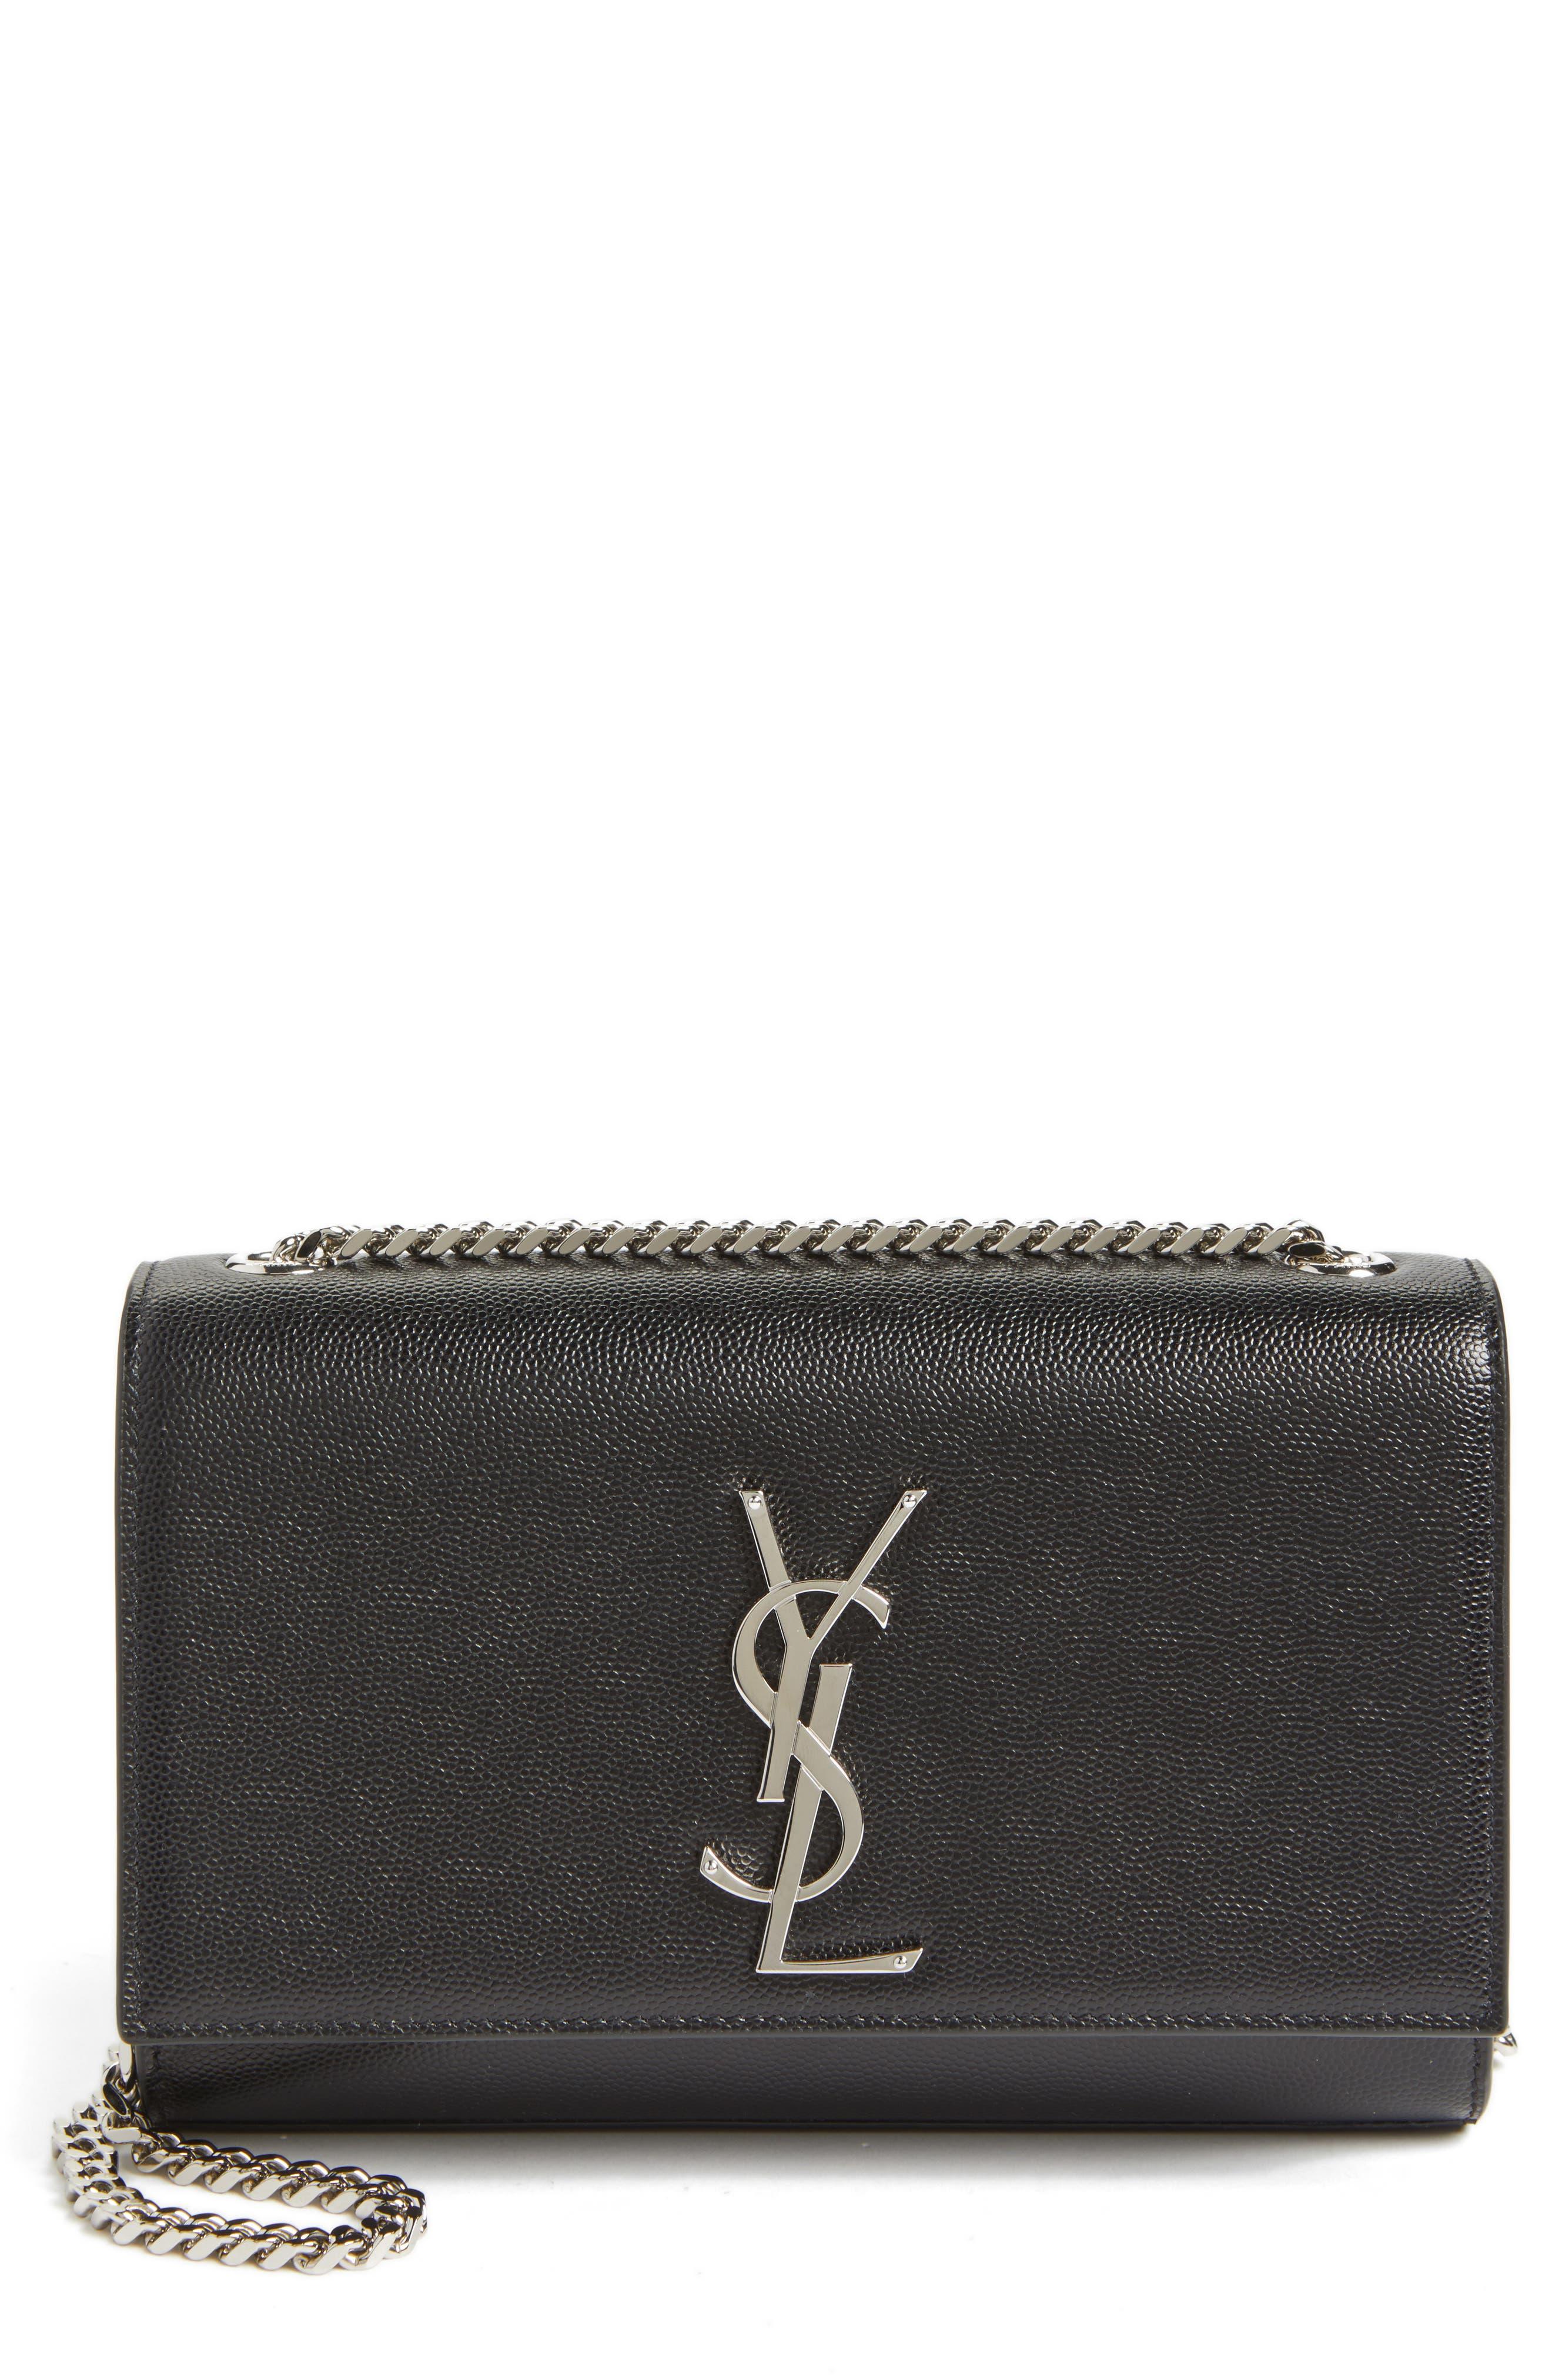 Small Kate Grained Leather Crossbody Bag,                             Main thumbnail 1, color,                             Noir